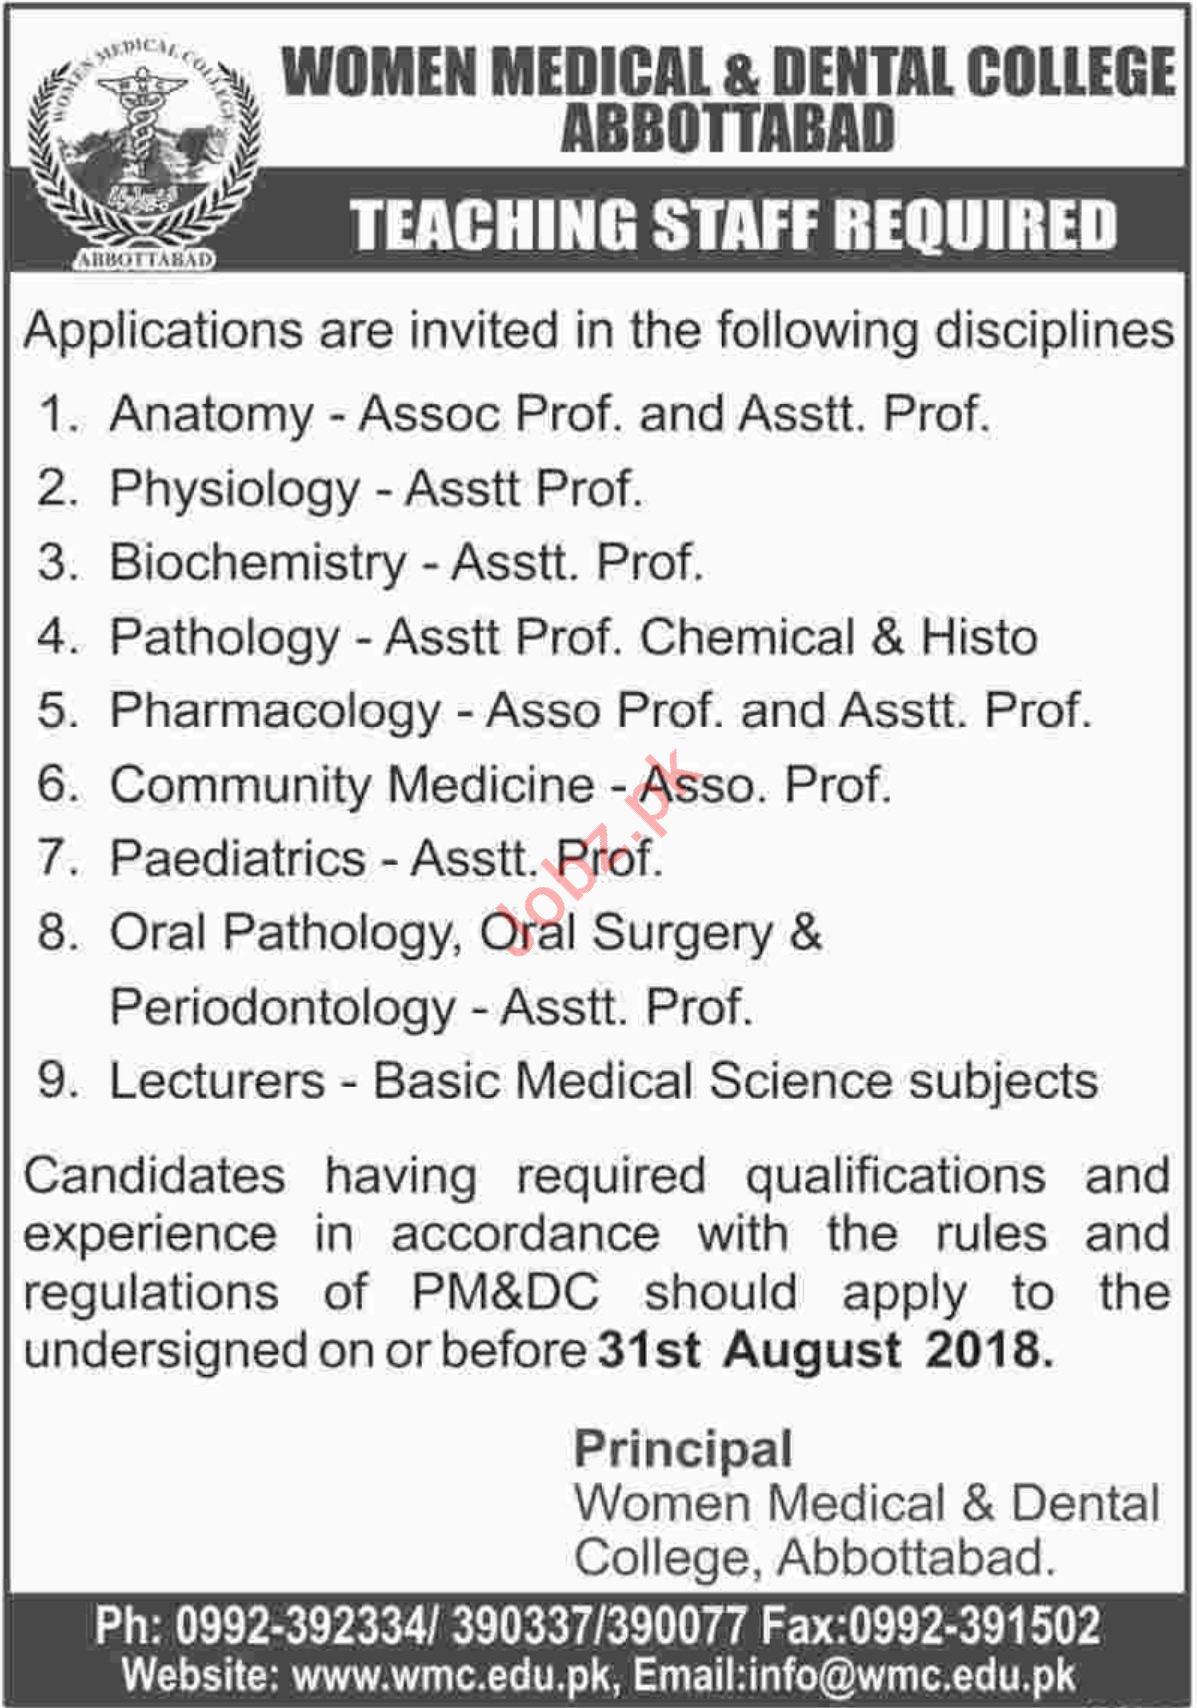 Women Medical & Dental College WMC Abbottabad Jobs 2018